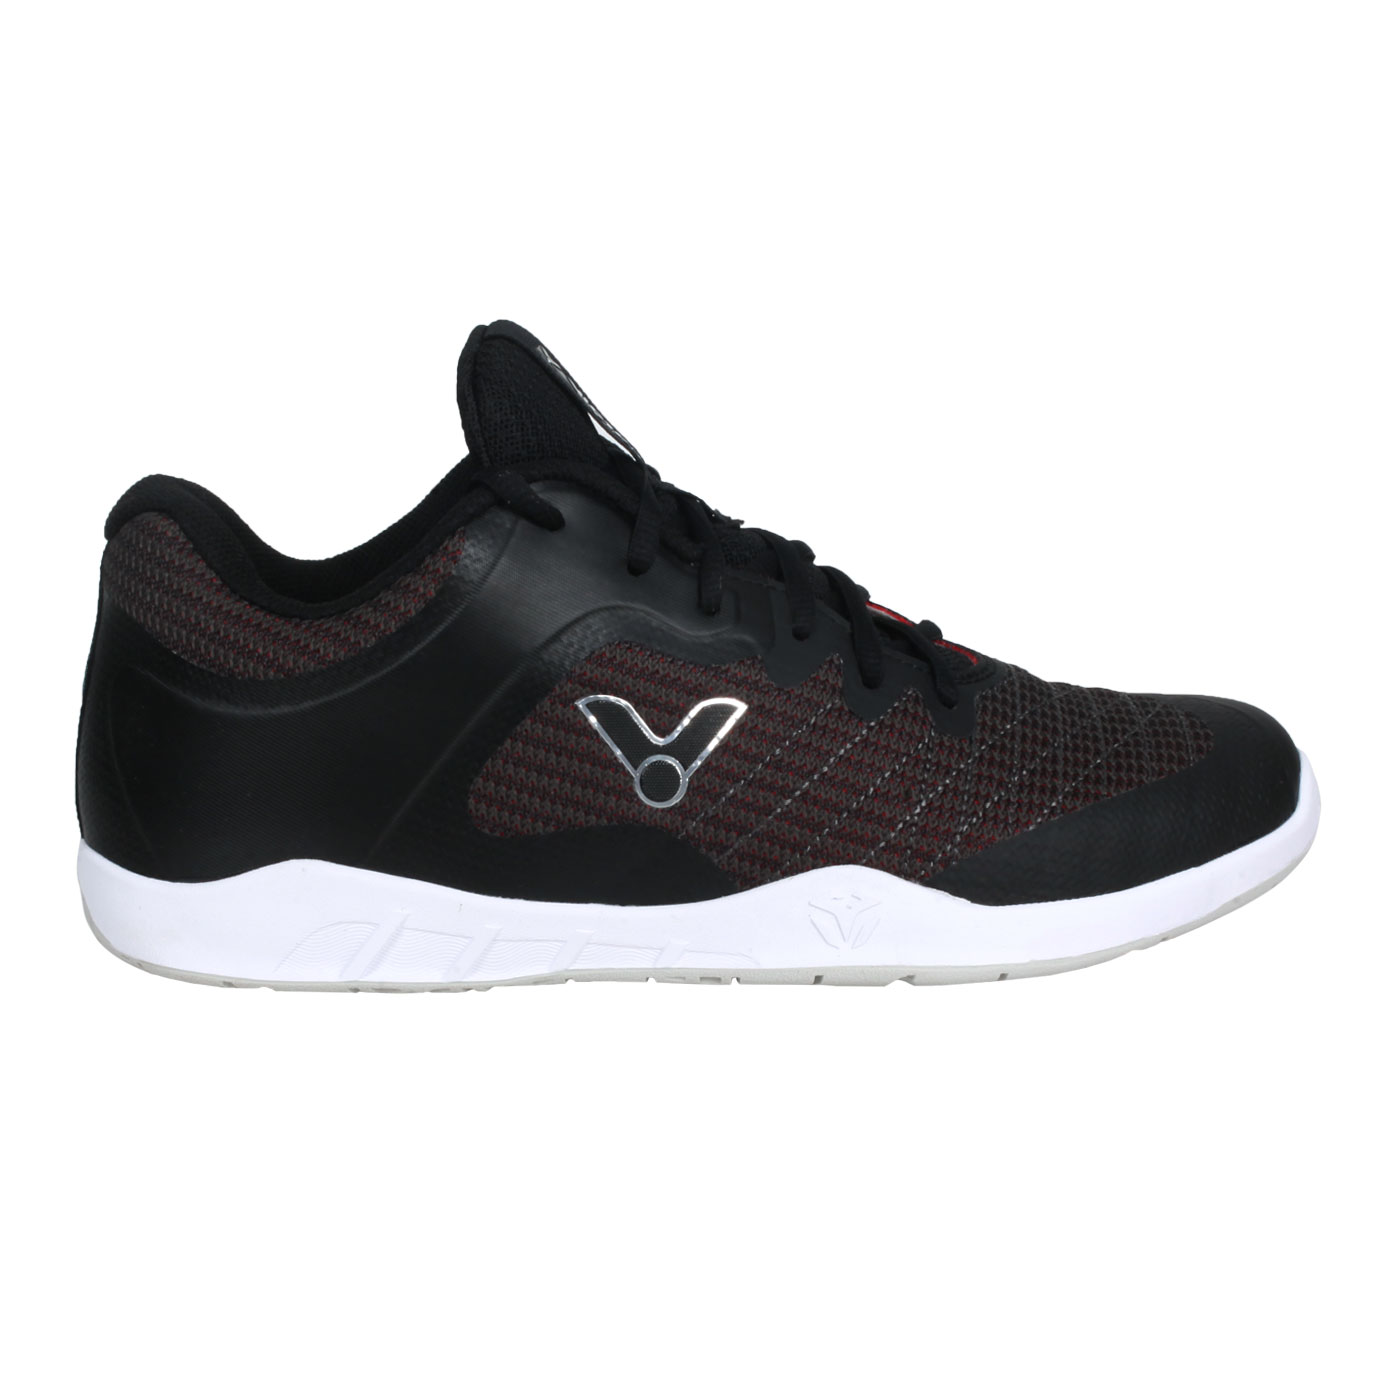 VICTOR 男款羽球鞋 VG1-C - 黑銀紅